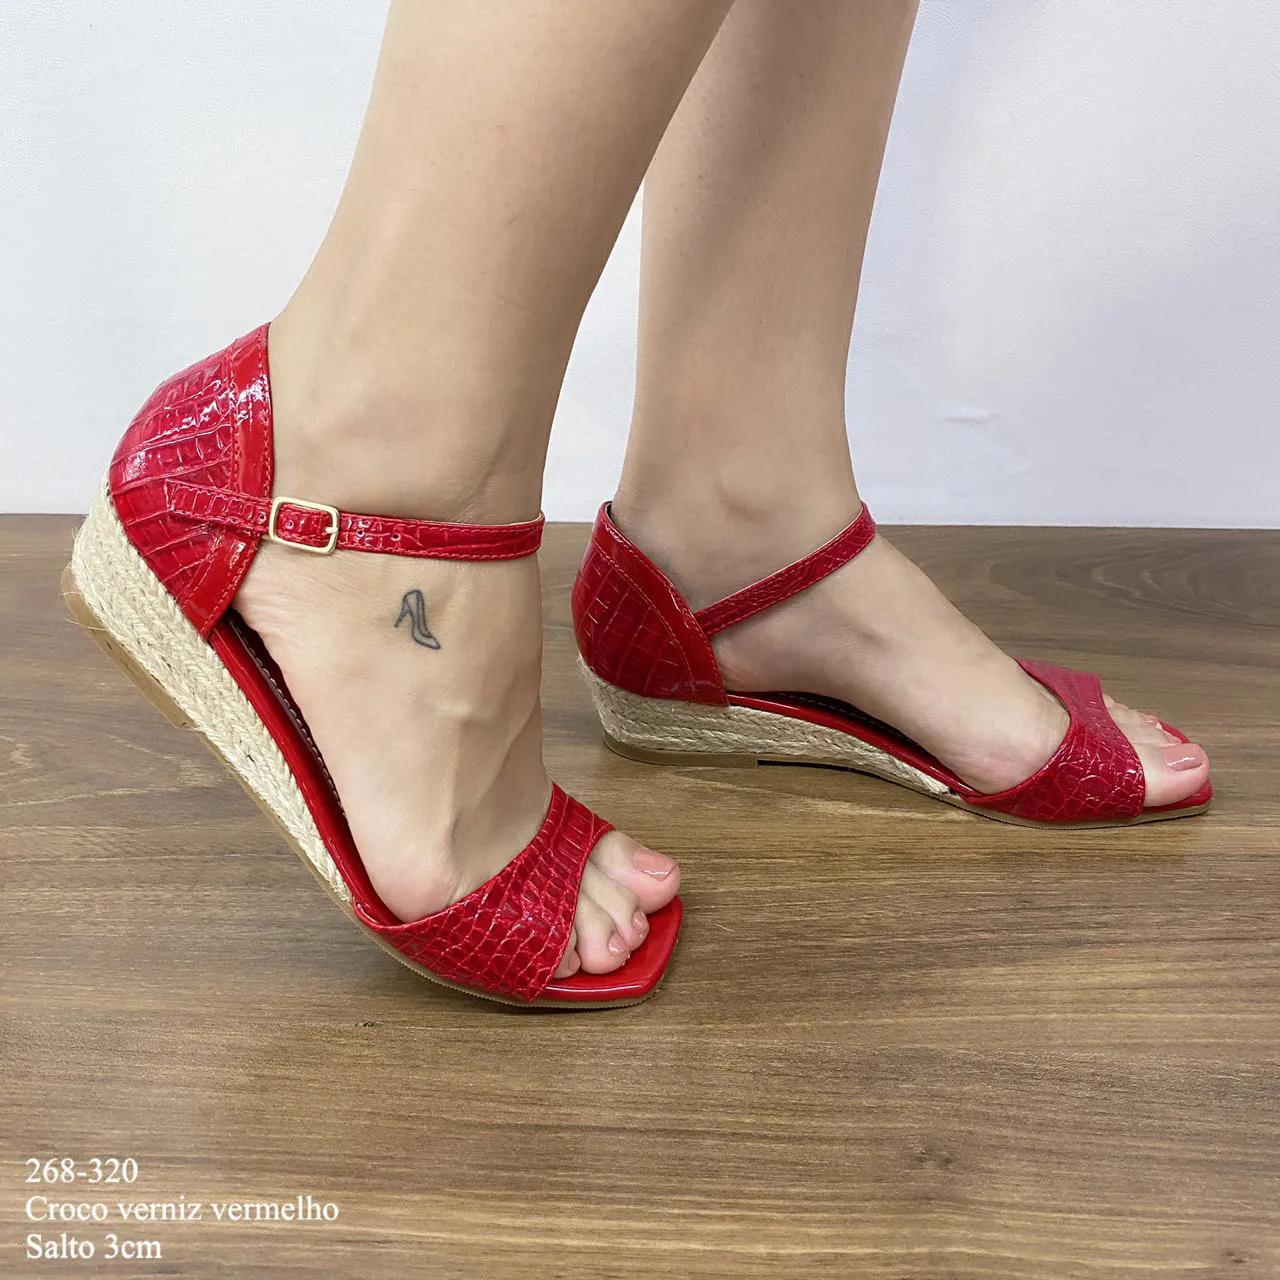 Anabela Vermelha Croco Verniz | D- 268-320